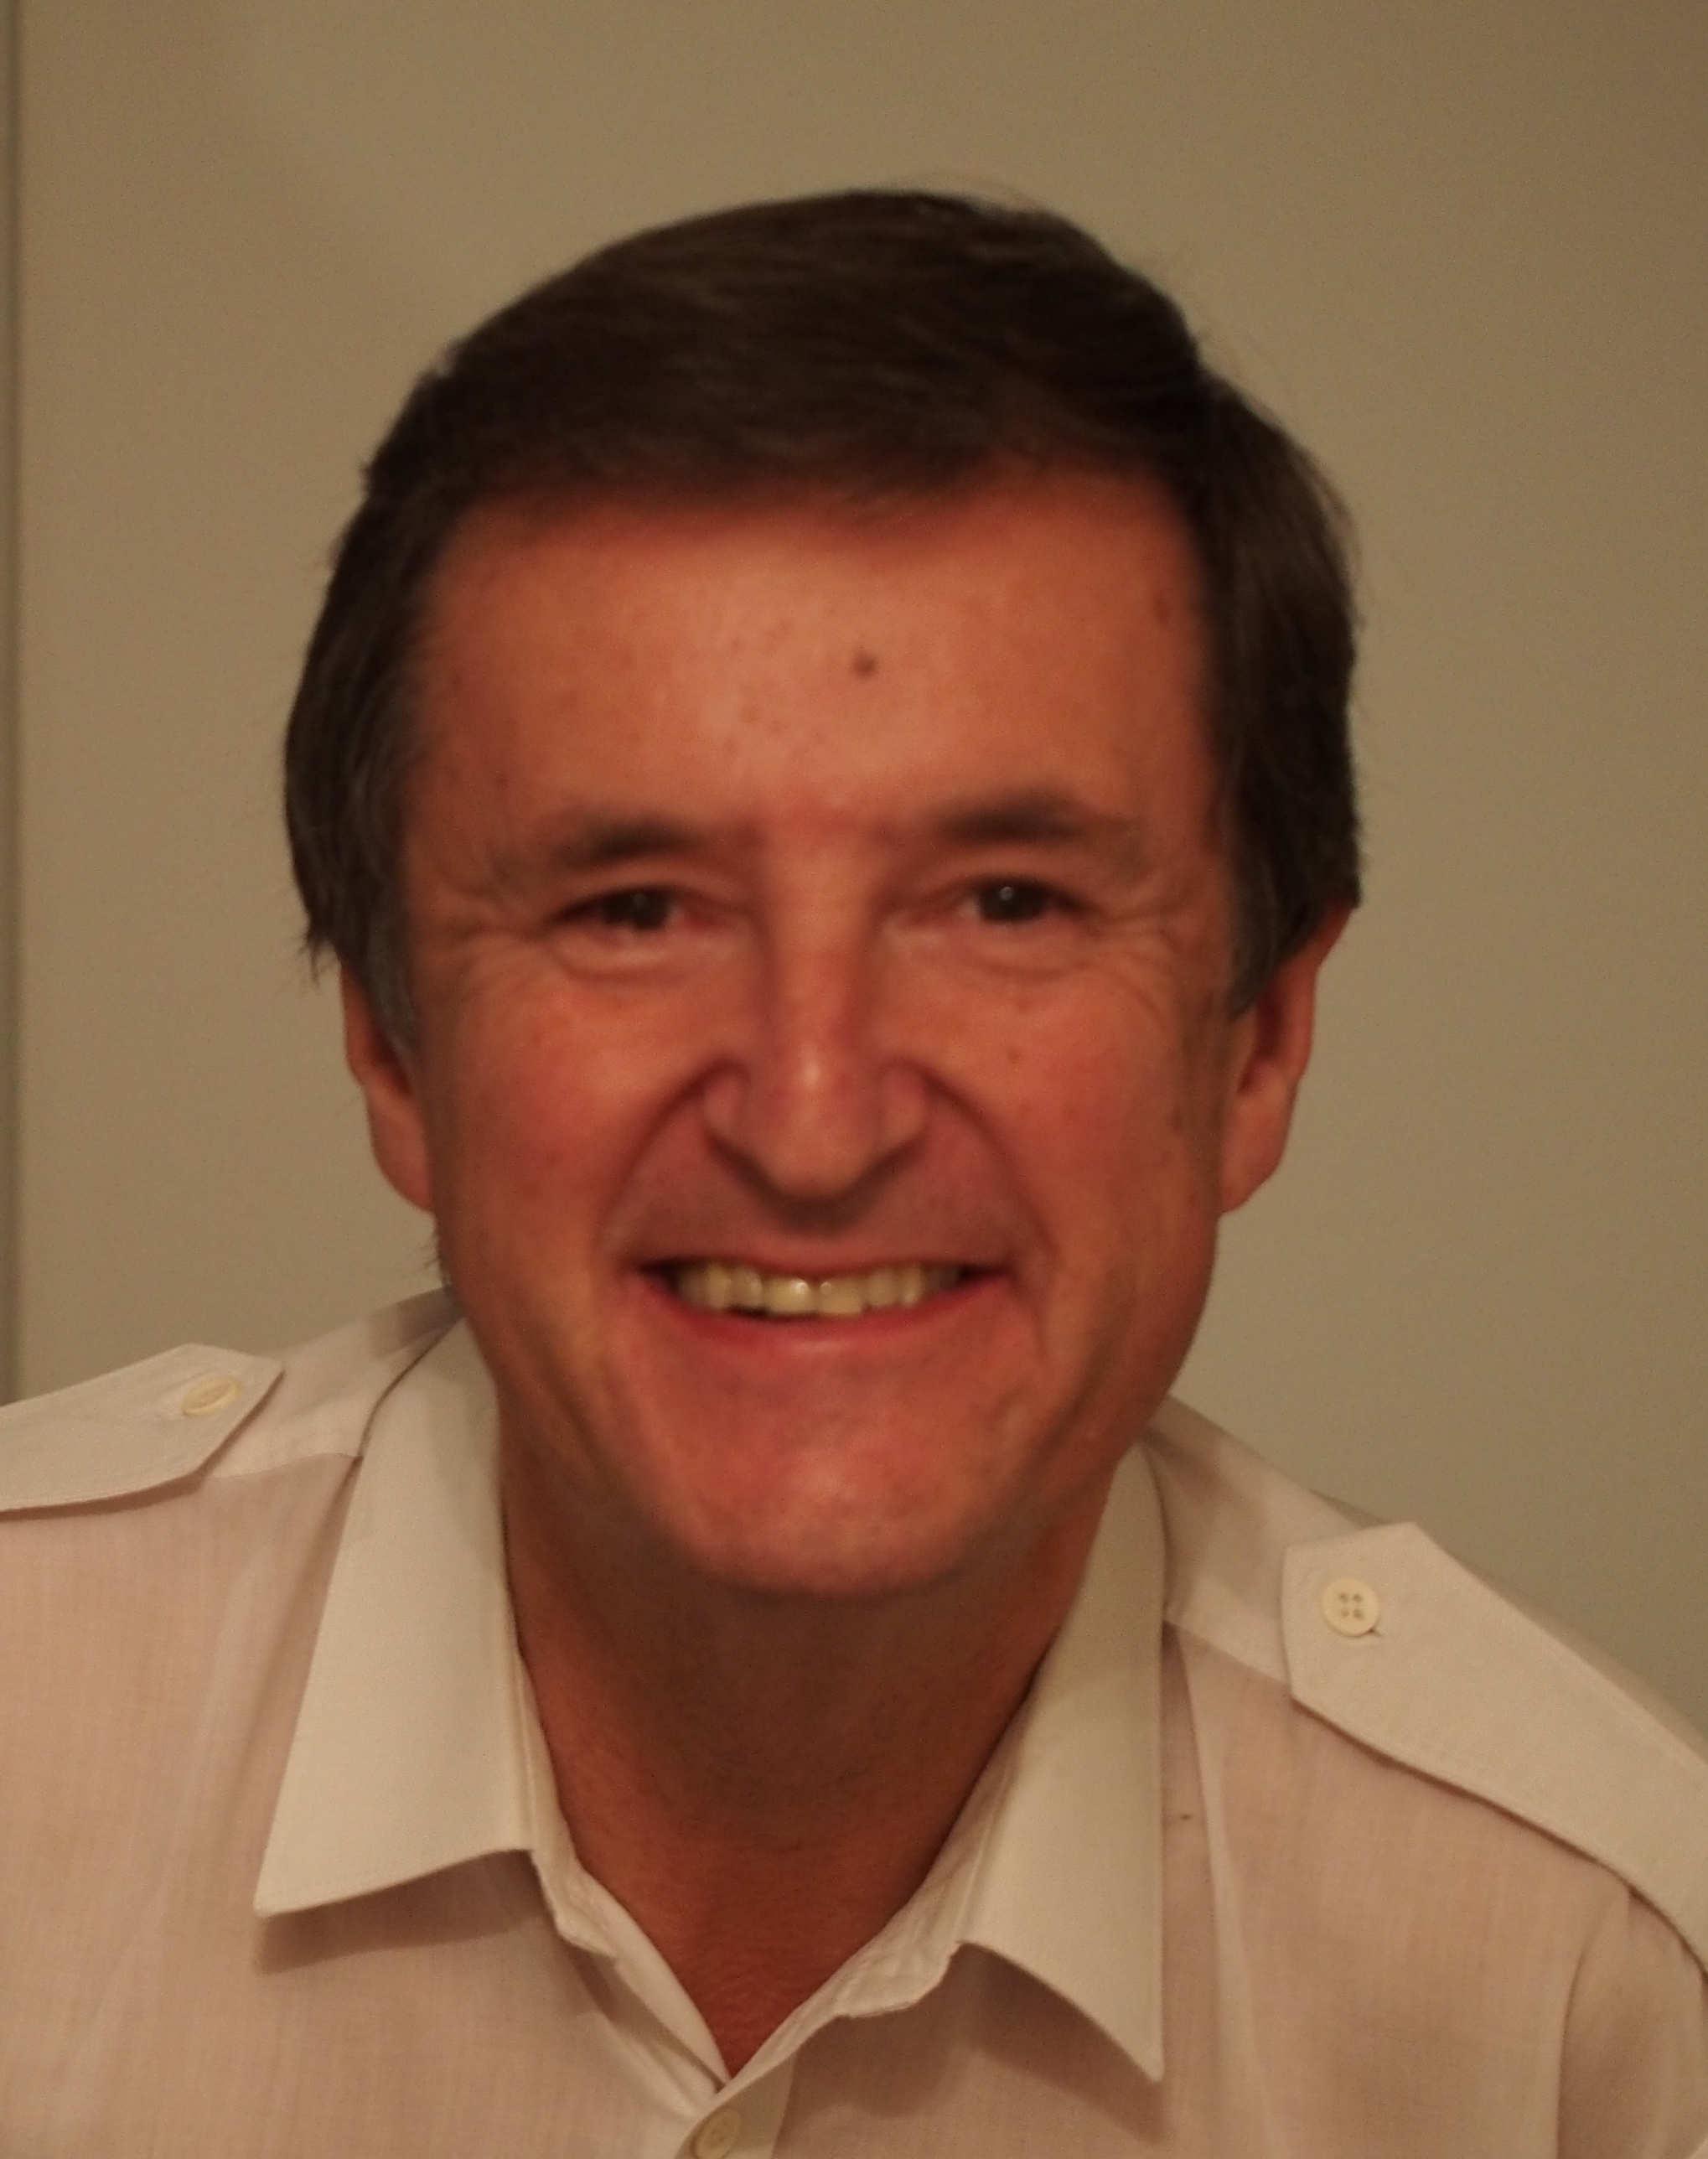 Herbert Mayer bei Lawinenabgang umgekommen